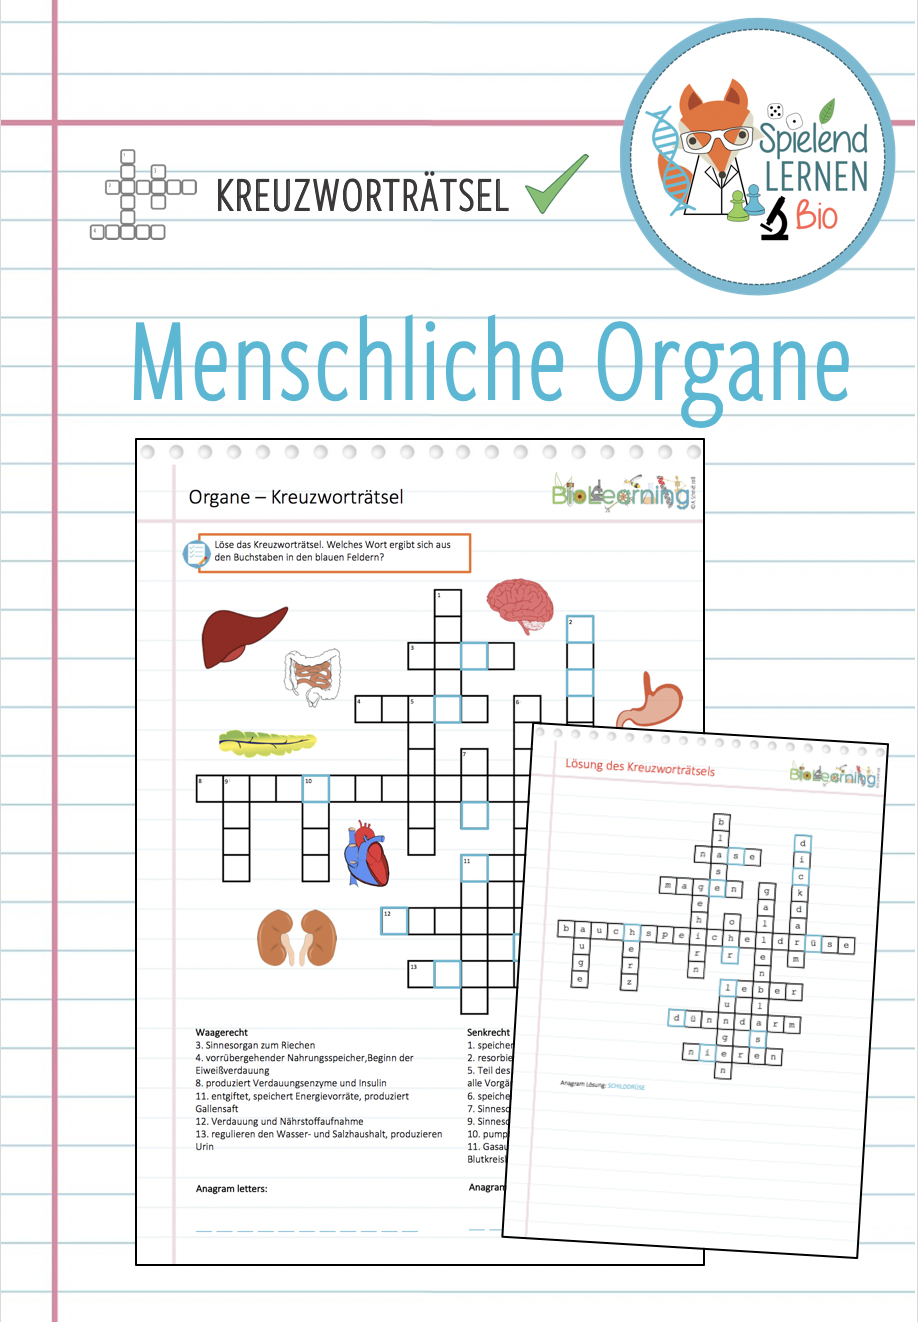 Organe Kreuzwortratsel Unterrichtsmaterial Im Fach Biologie Unterrichtsmaterial Biologie Kreuzwortratsel